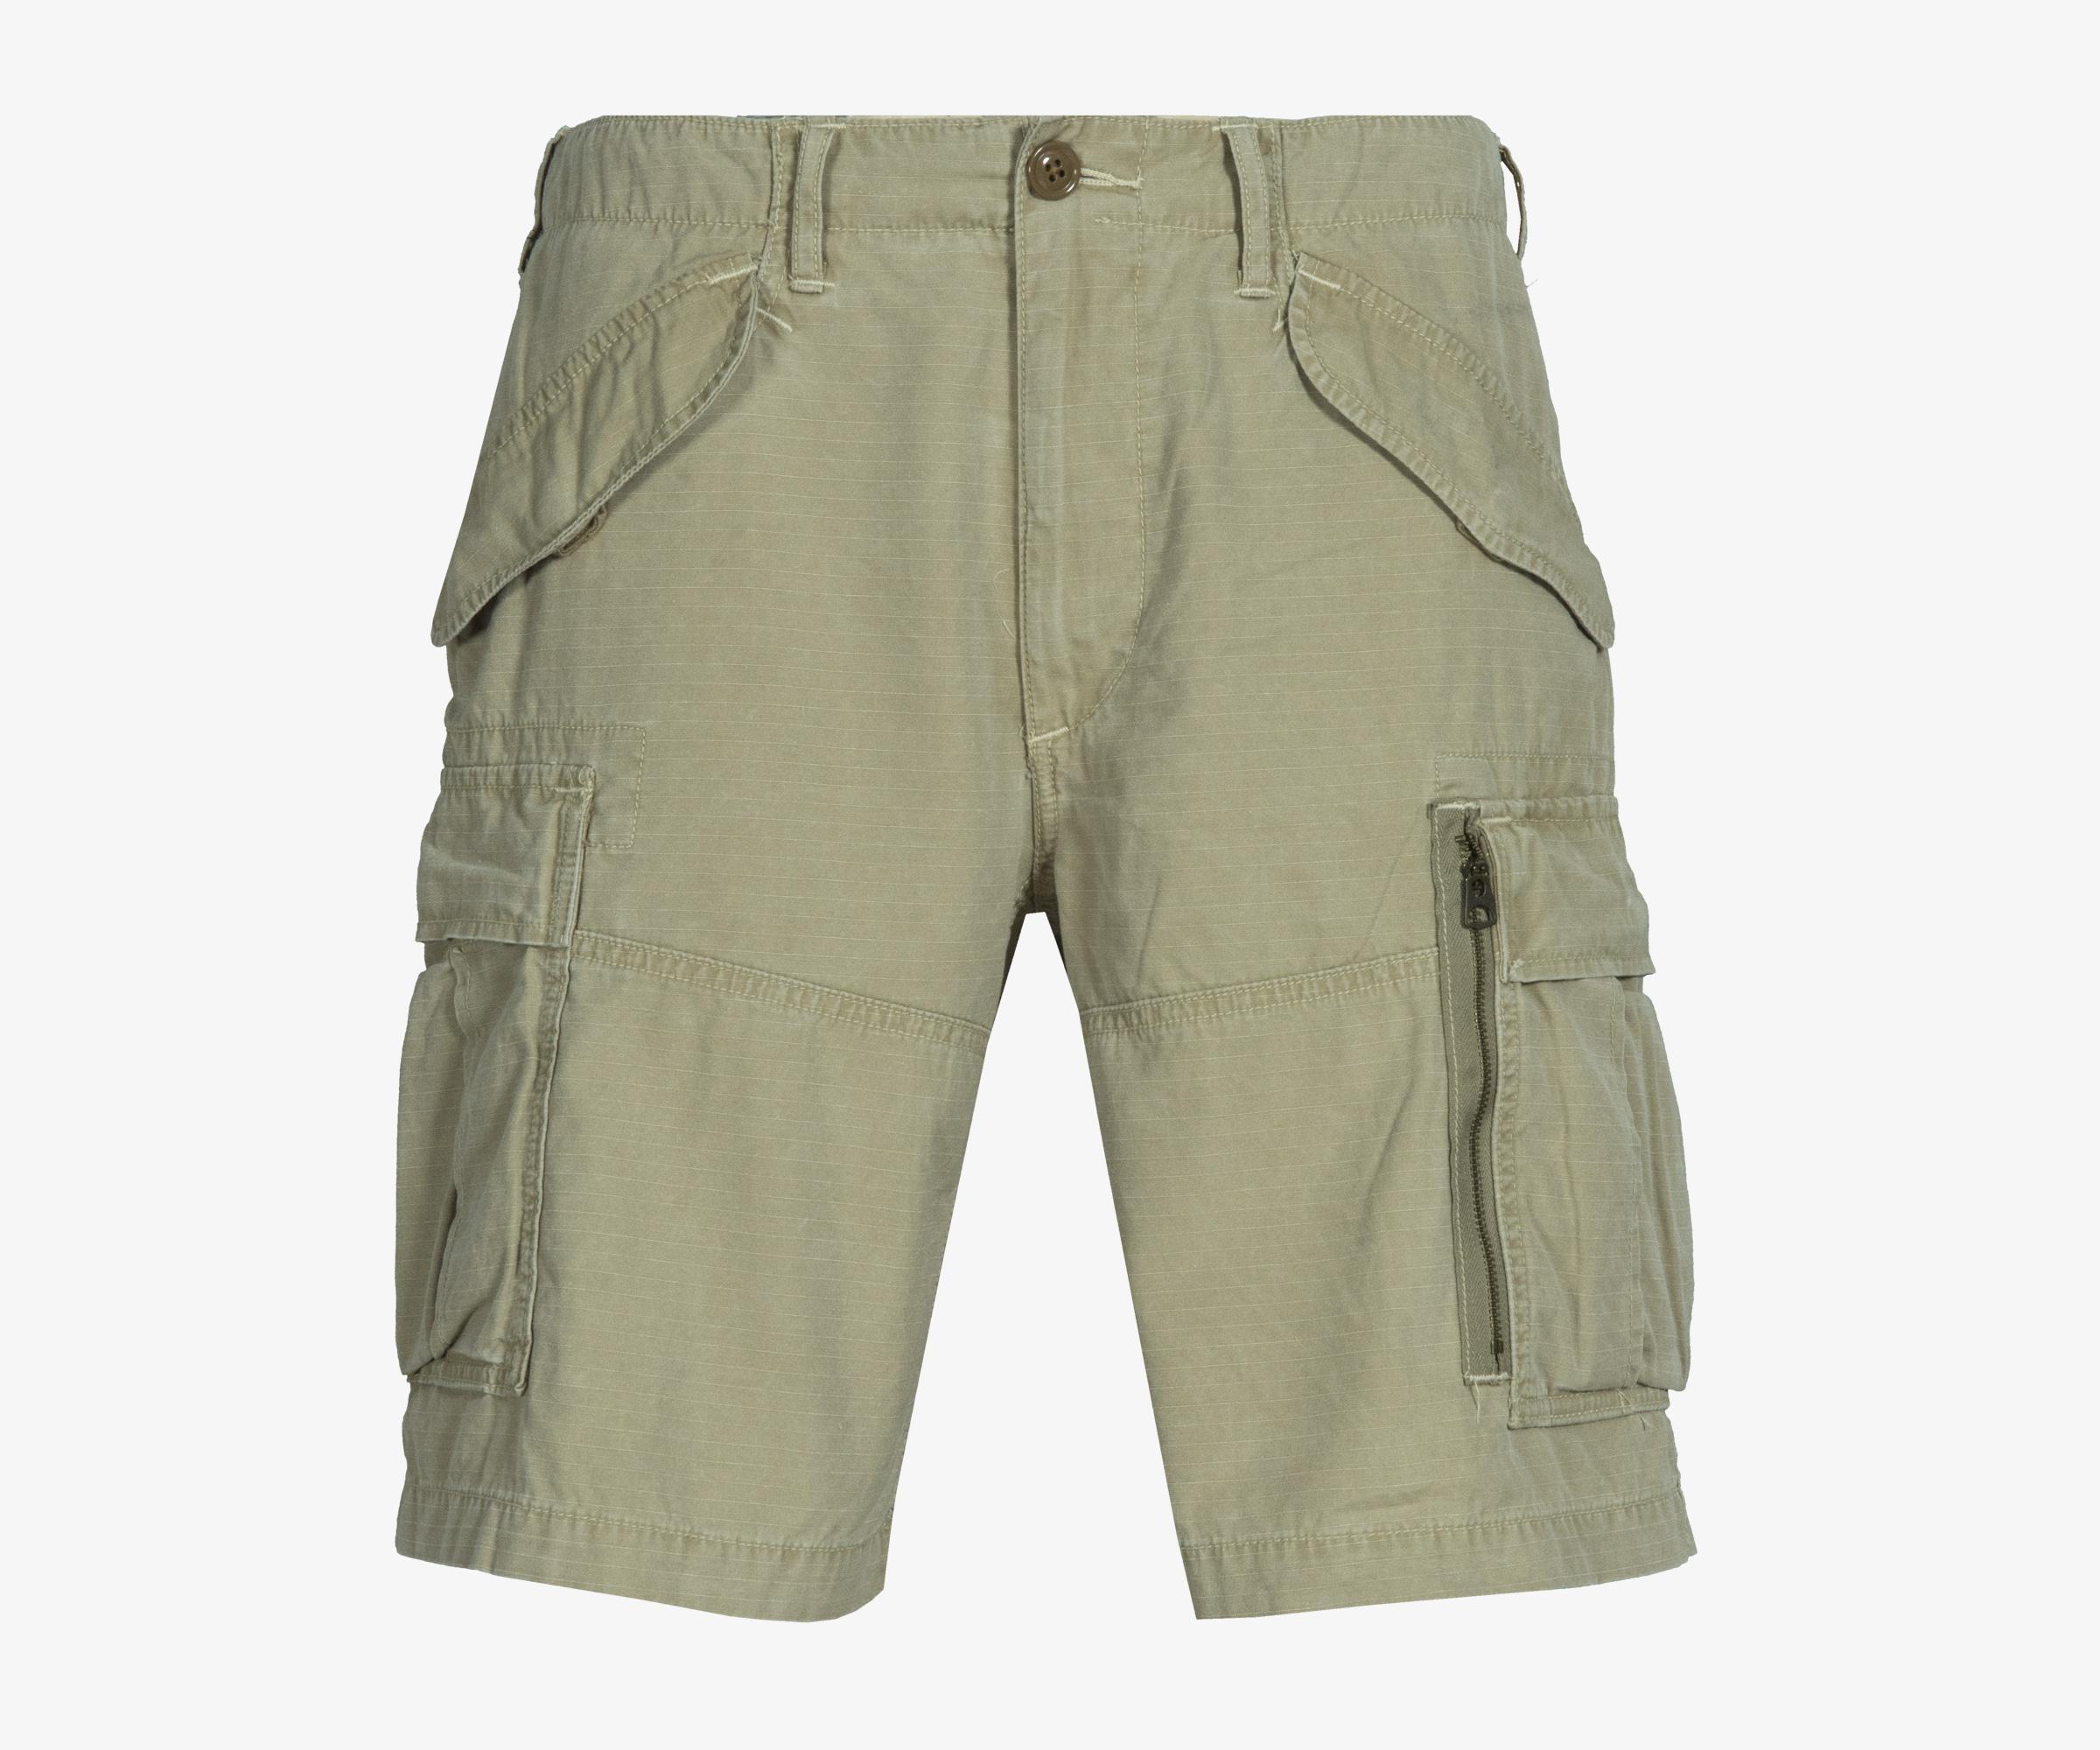 For Pocket Khaki Cargo Lauren Polo Natural Fit Boating Classic Ralph Men Short 8wP0nOk